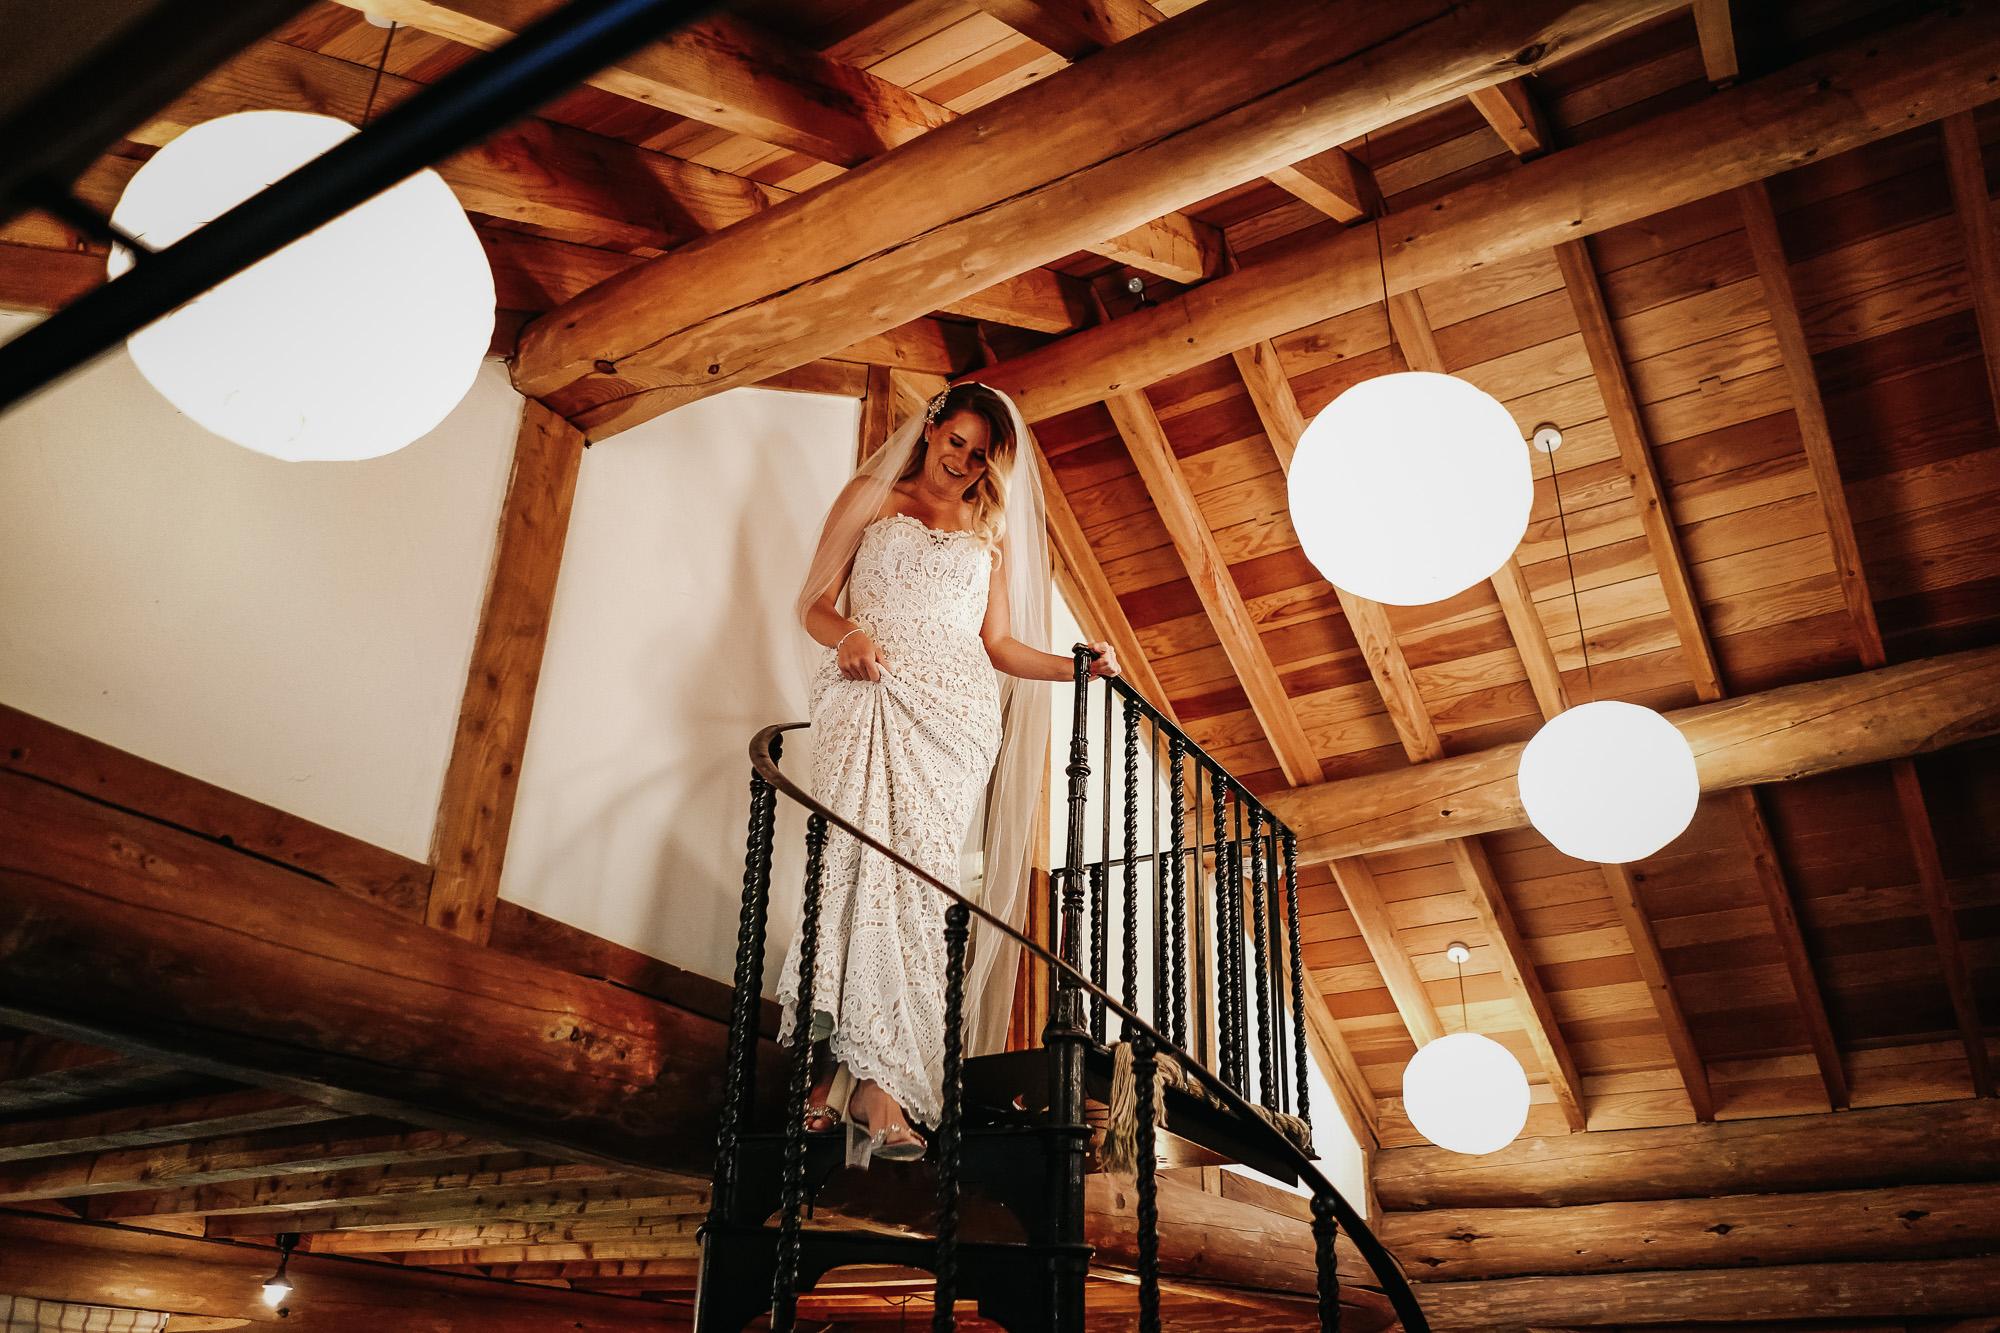 High Barn Wedding photographer lake distect penrith documentry wedding photography (16 of 57).jpg